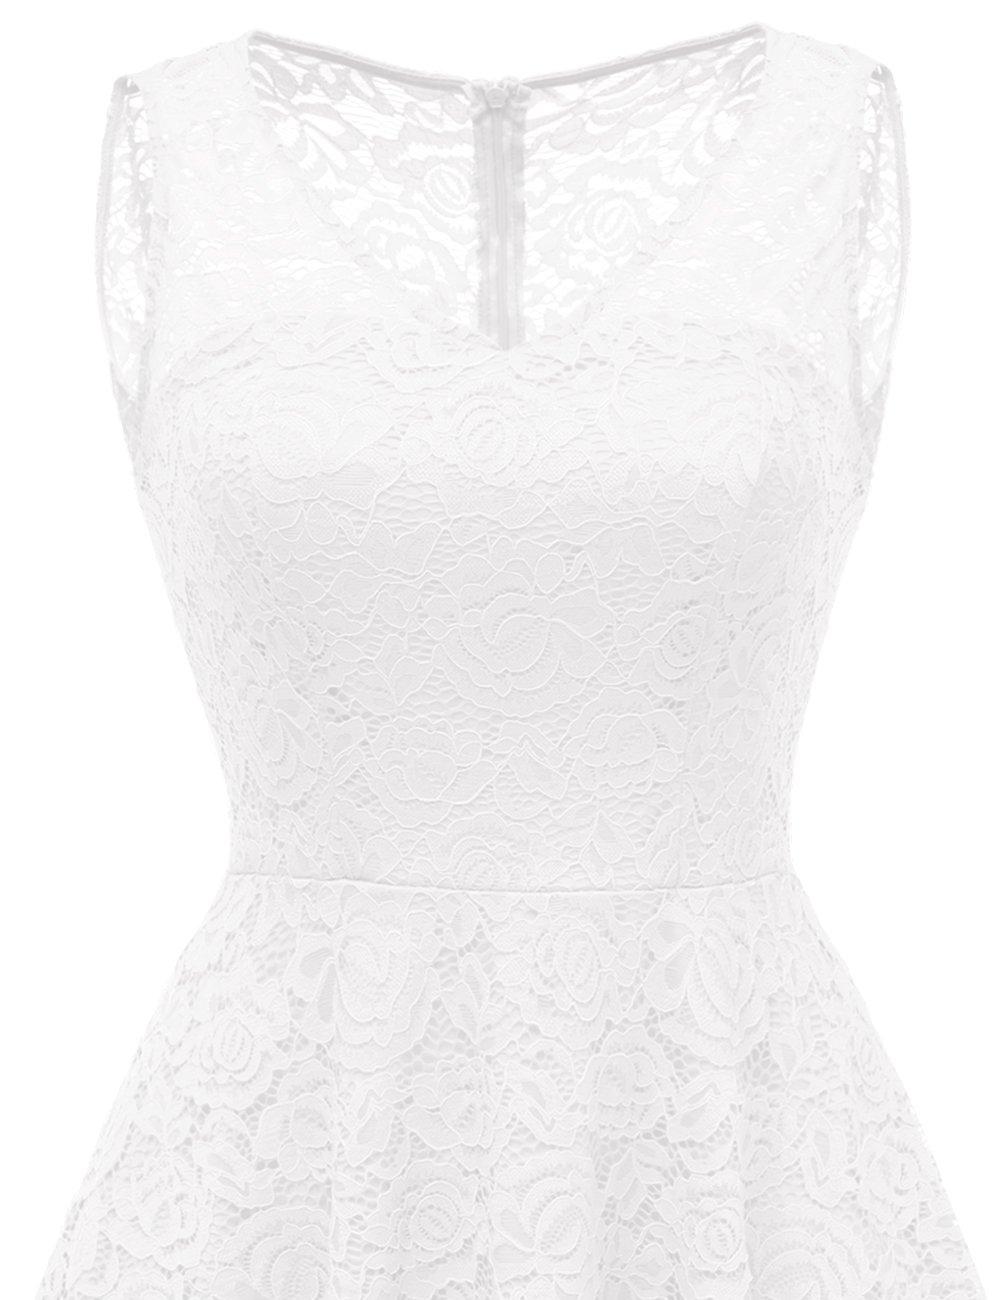 DRESSTELLS Women's Cocktail V-Neck Dress Floral Lace Hi-Lo Formal Swing Party Dress White XL by DRESSTELLS (Image #6)